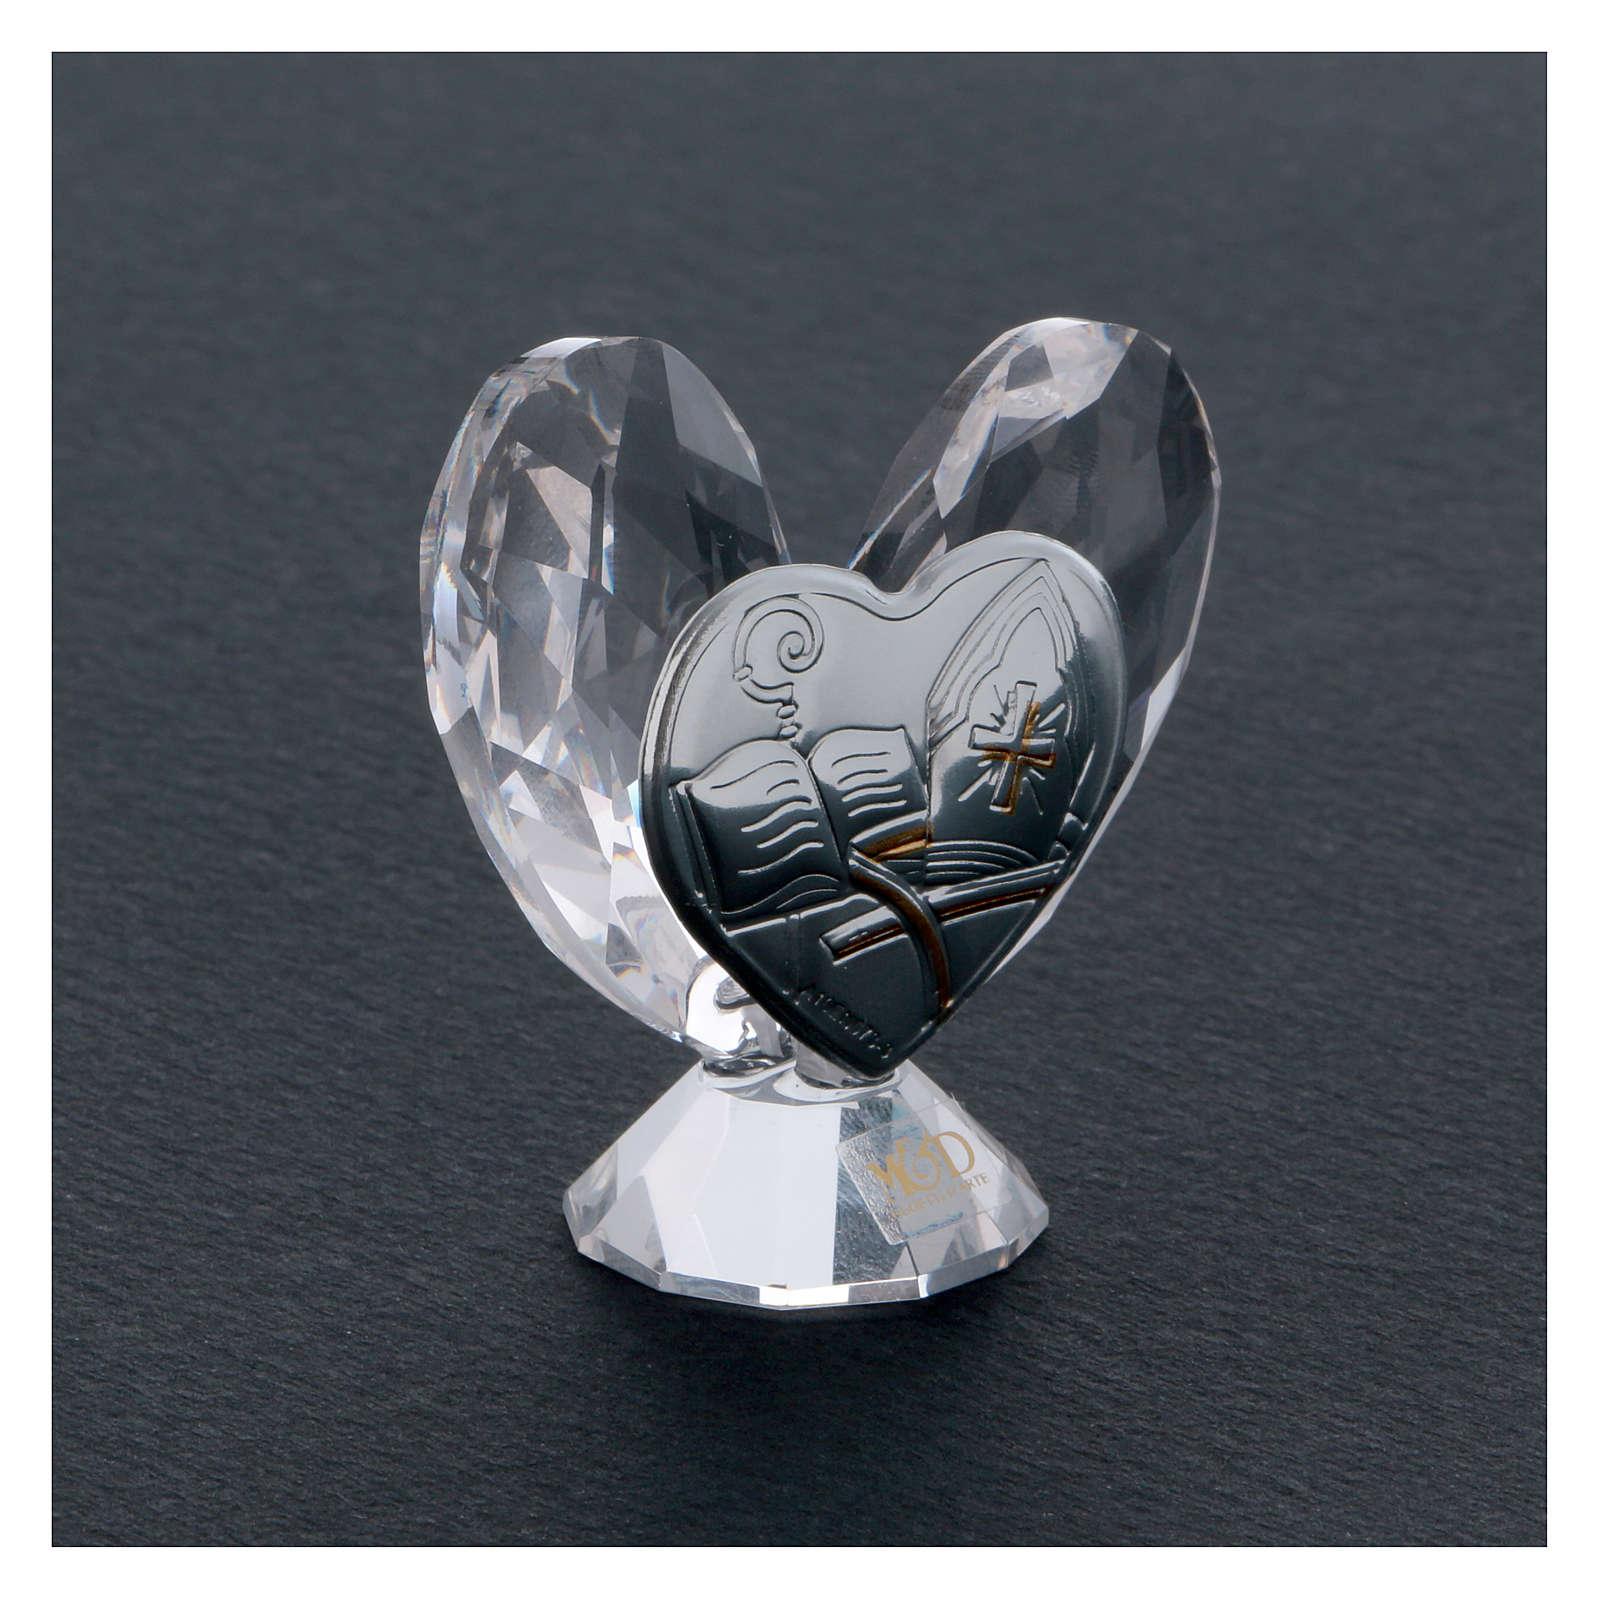 Bombonniere Firmung Herz Form Kristall und Silber Platte 5x5cm 3